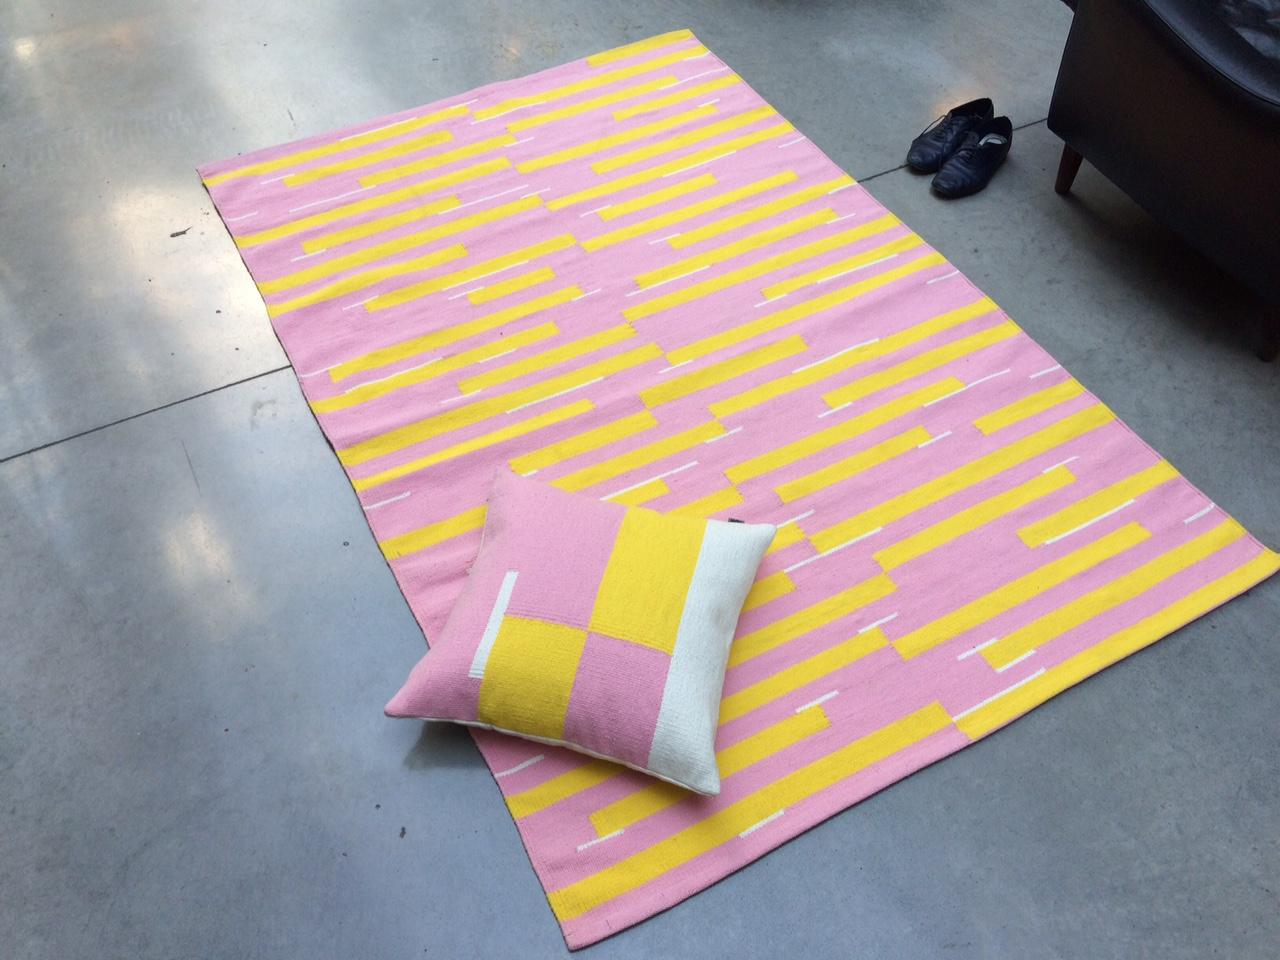 Jama-khan rugs in pink - 120 x 180 cms Jama-khan square cushion - 45 x 45 cms 100%handwoven cotton